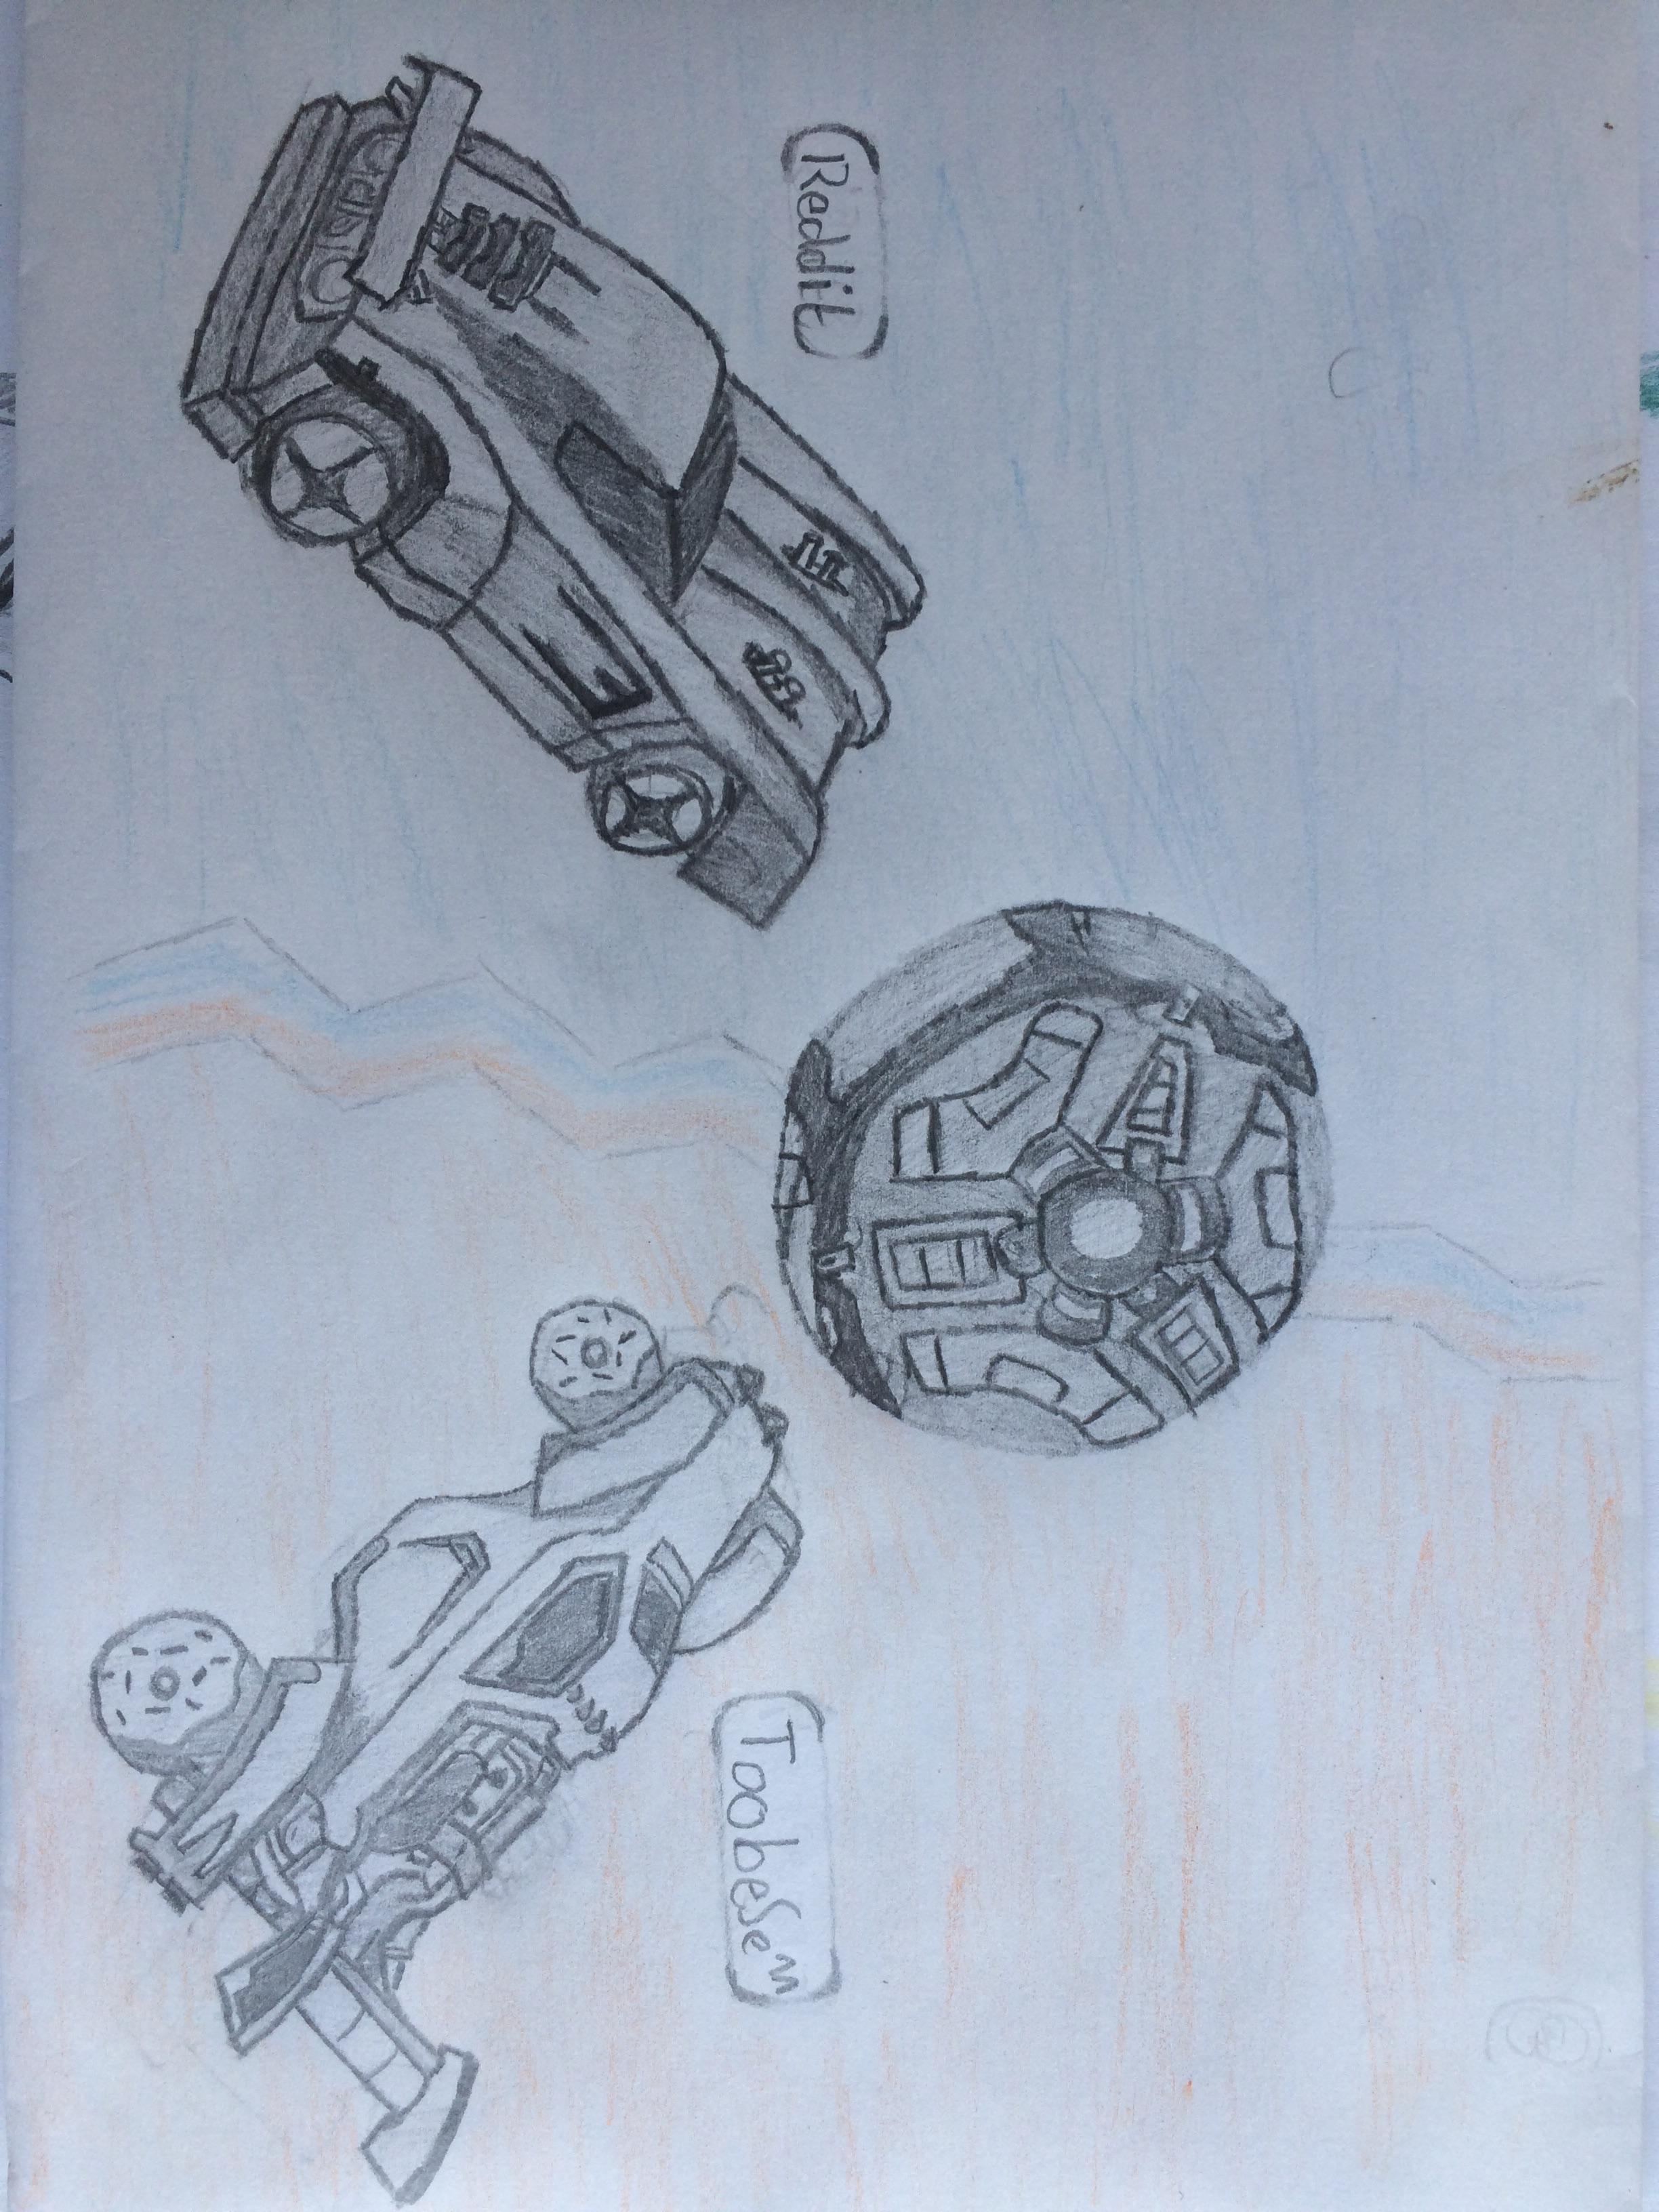 Rocket League Drawing : rocket, league, drawing, Tried, Drawing, Rocket, League, RocketLeague